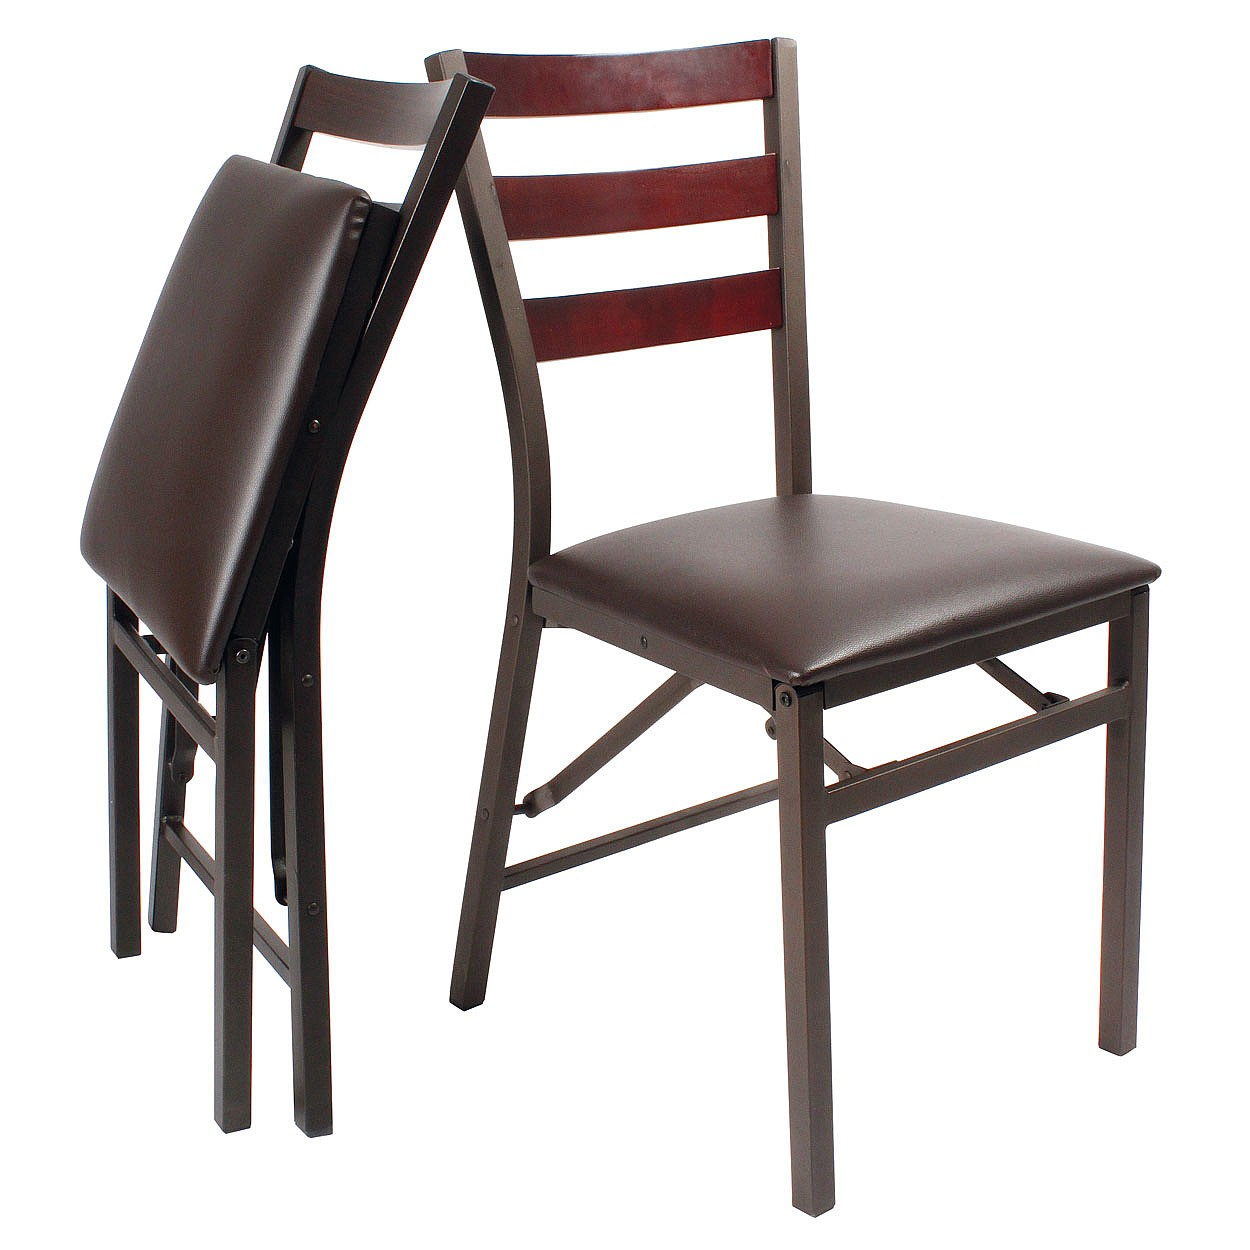 Coopers of Stortford Set of 2 Folding Dining Chairs from Coopers – Foldable Dining Chairs